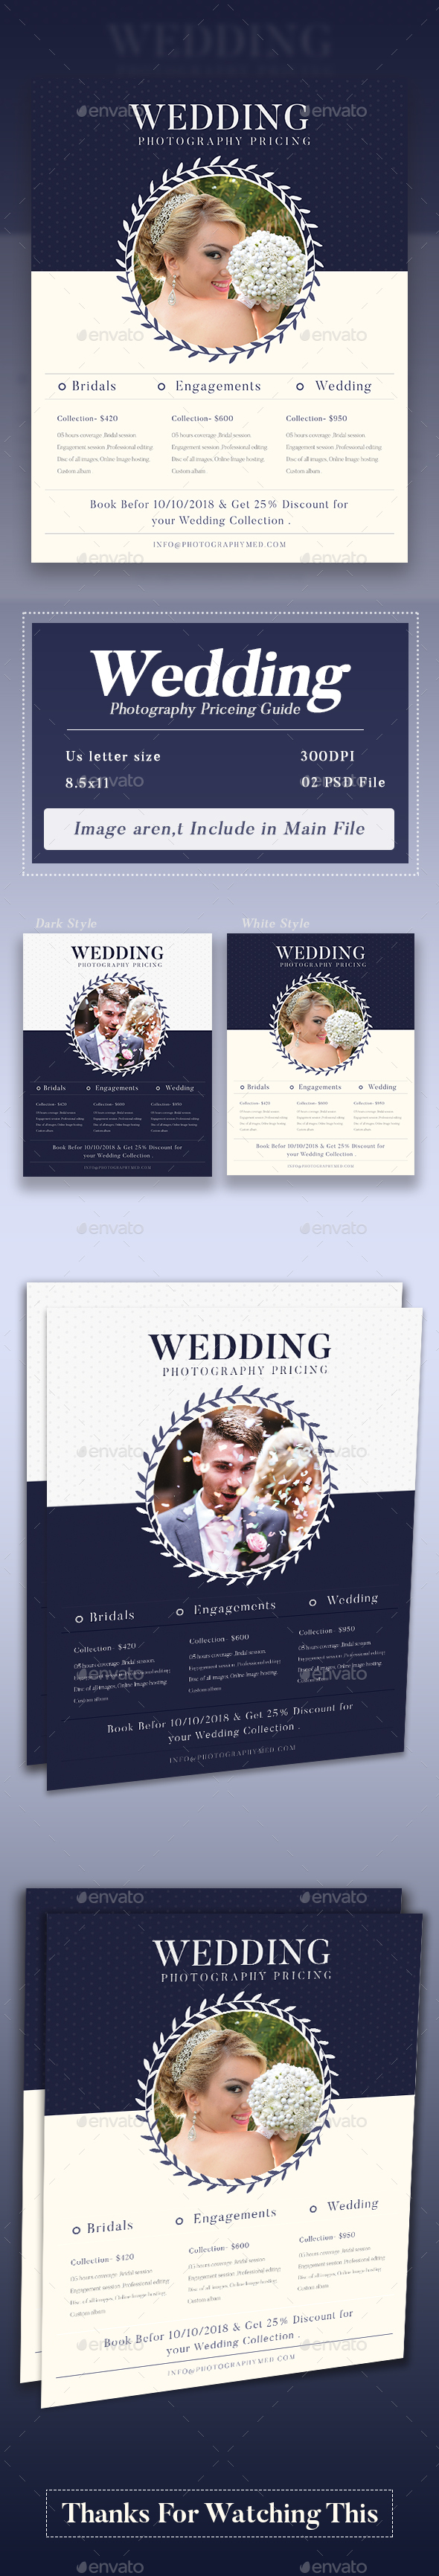 GraphicRiver Photographer Price Guide 20857282